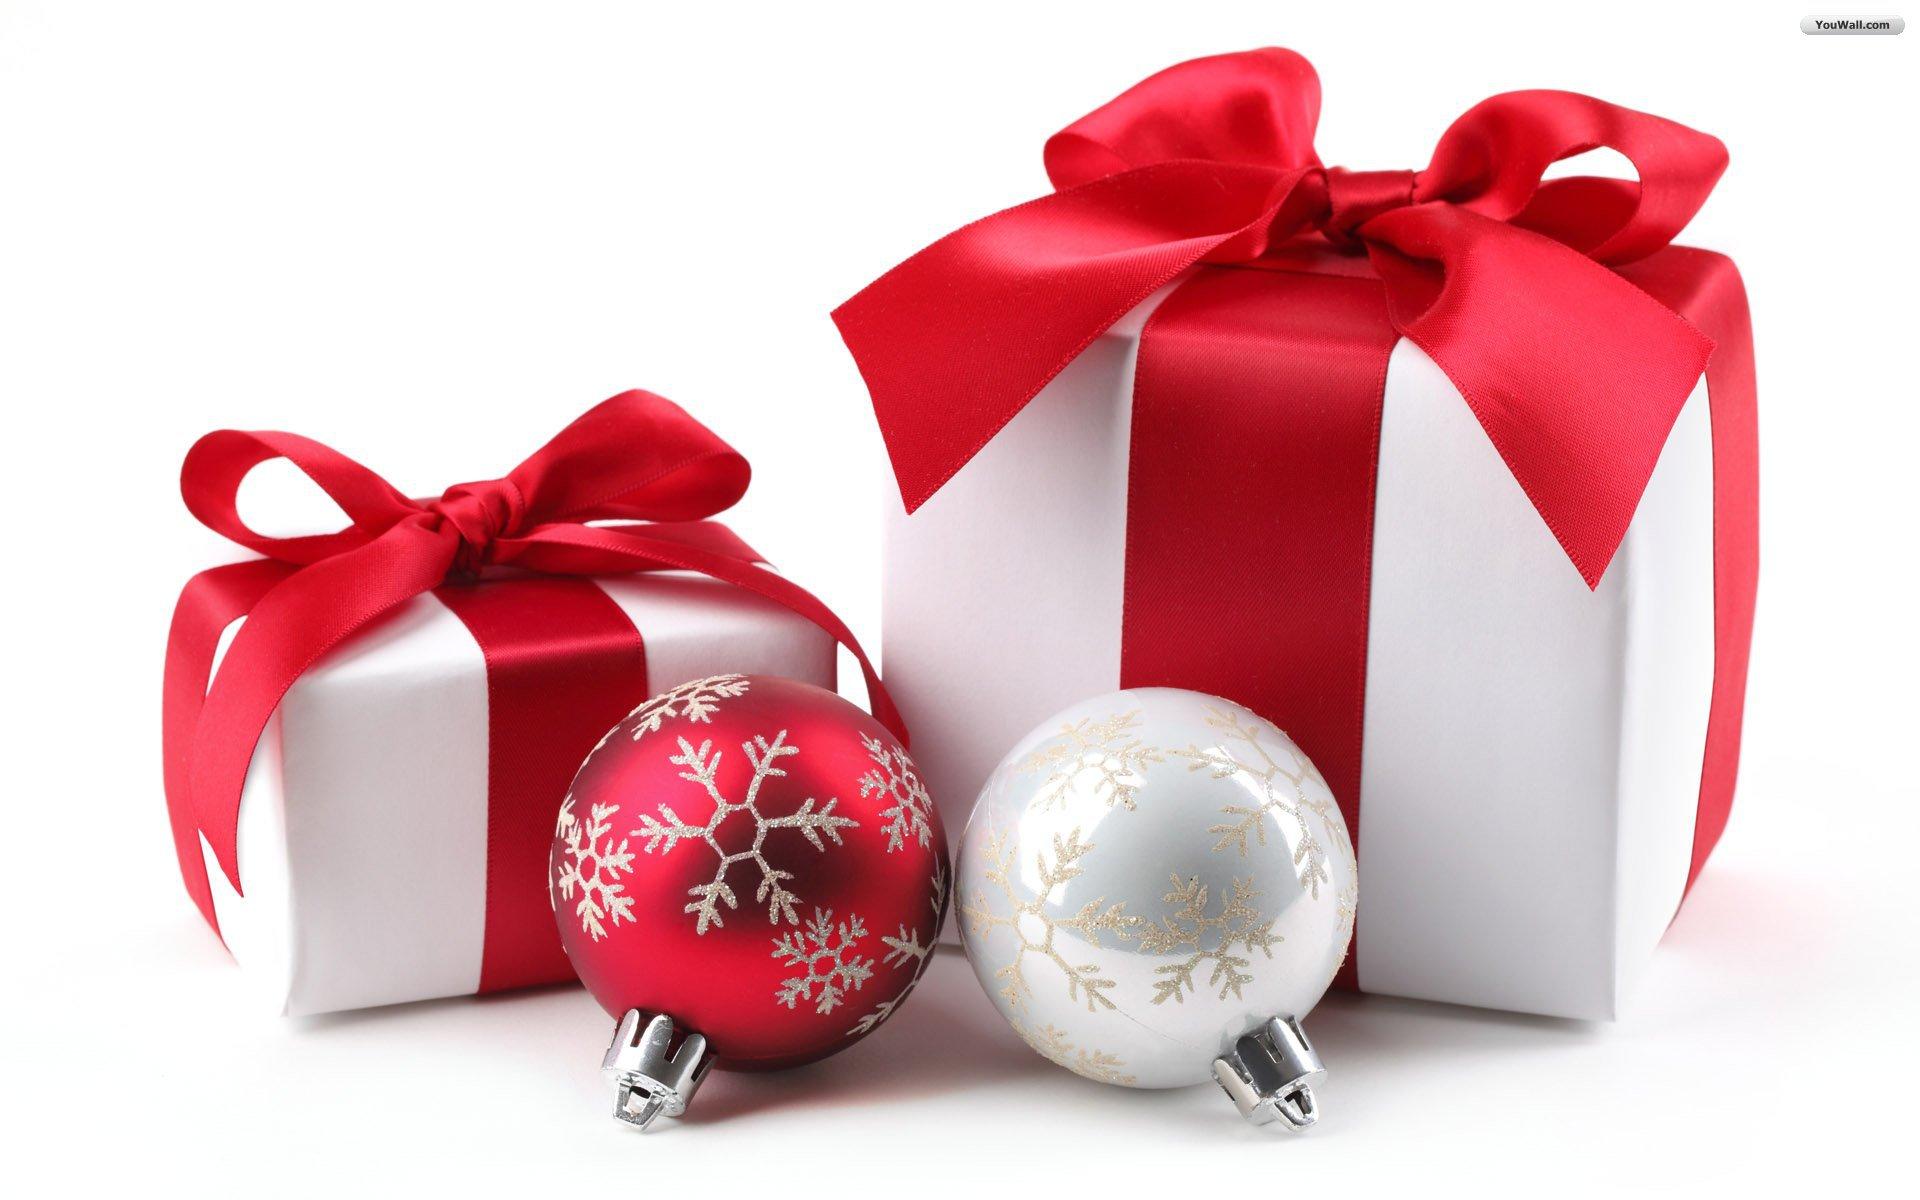 Gift boxes and Christmas decorations on Christmas ...